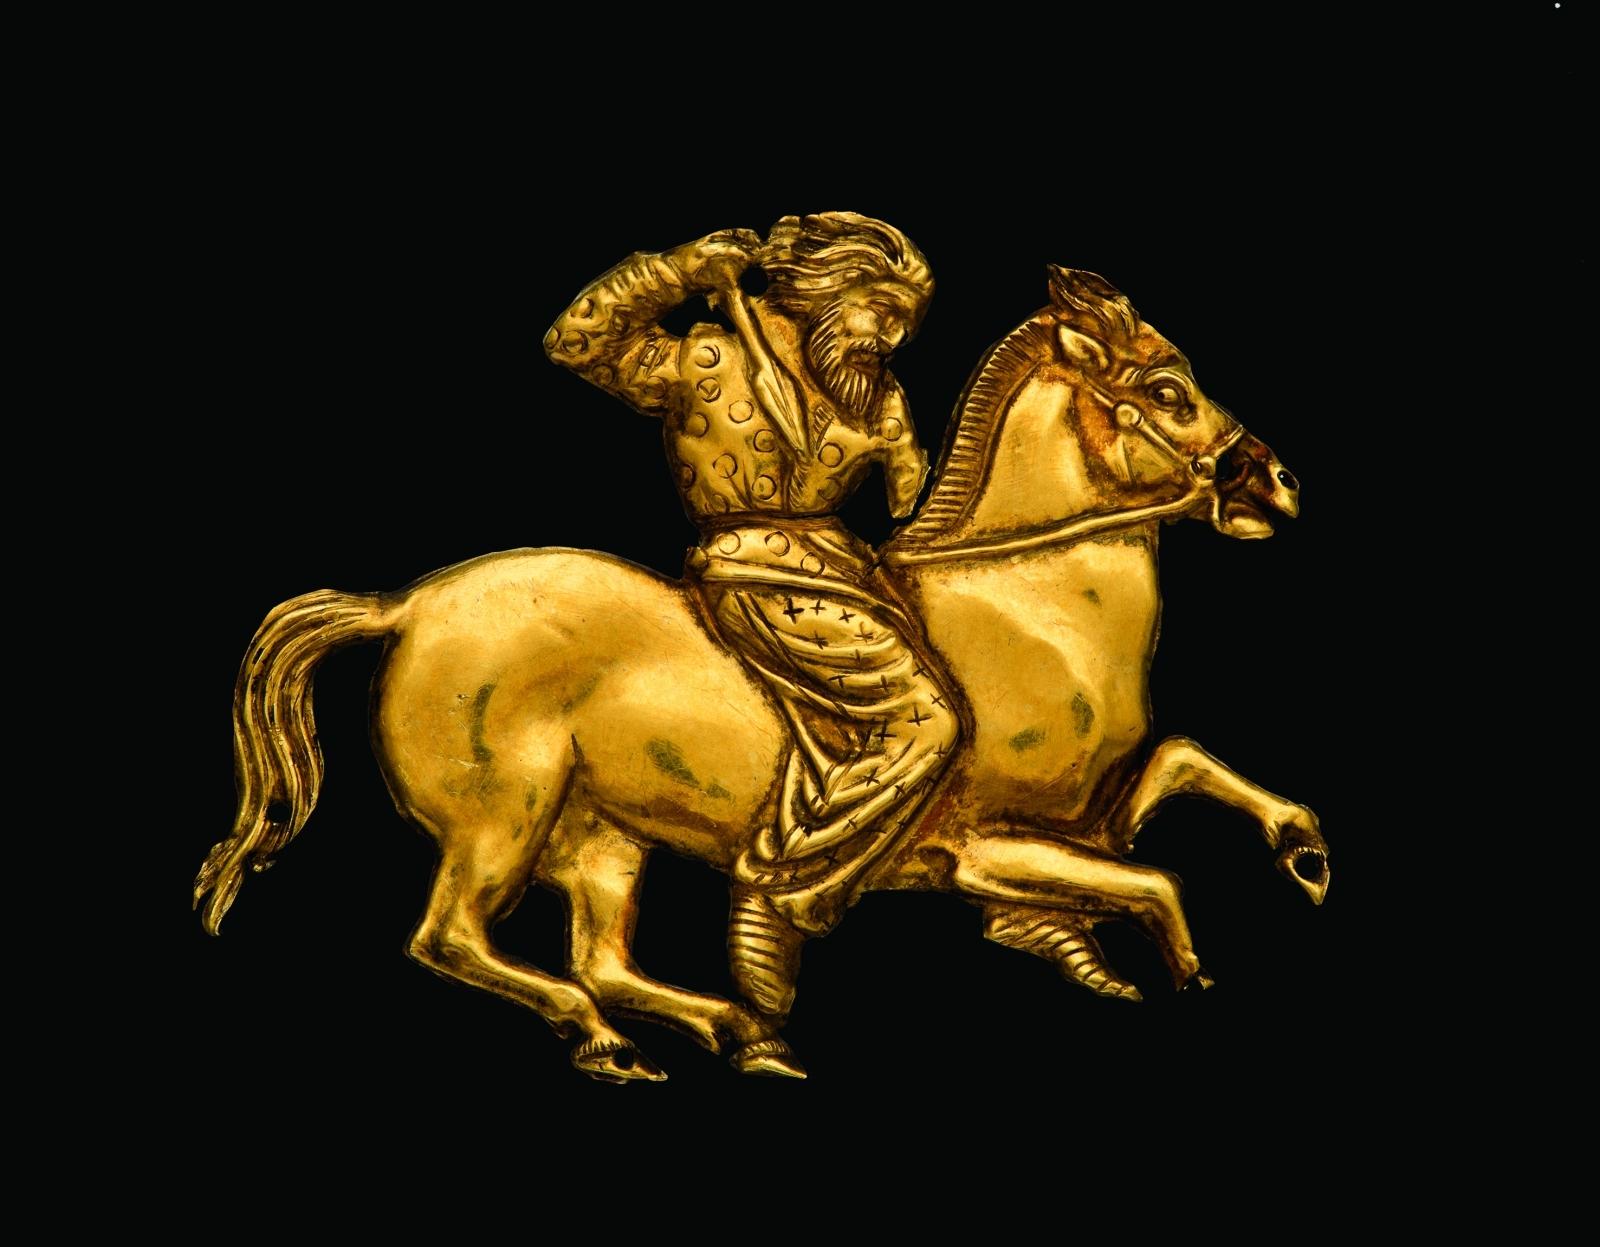 Scythian rider